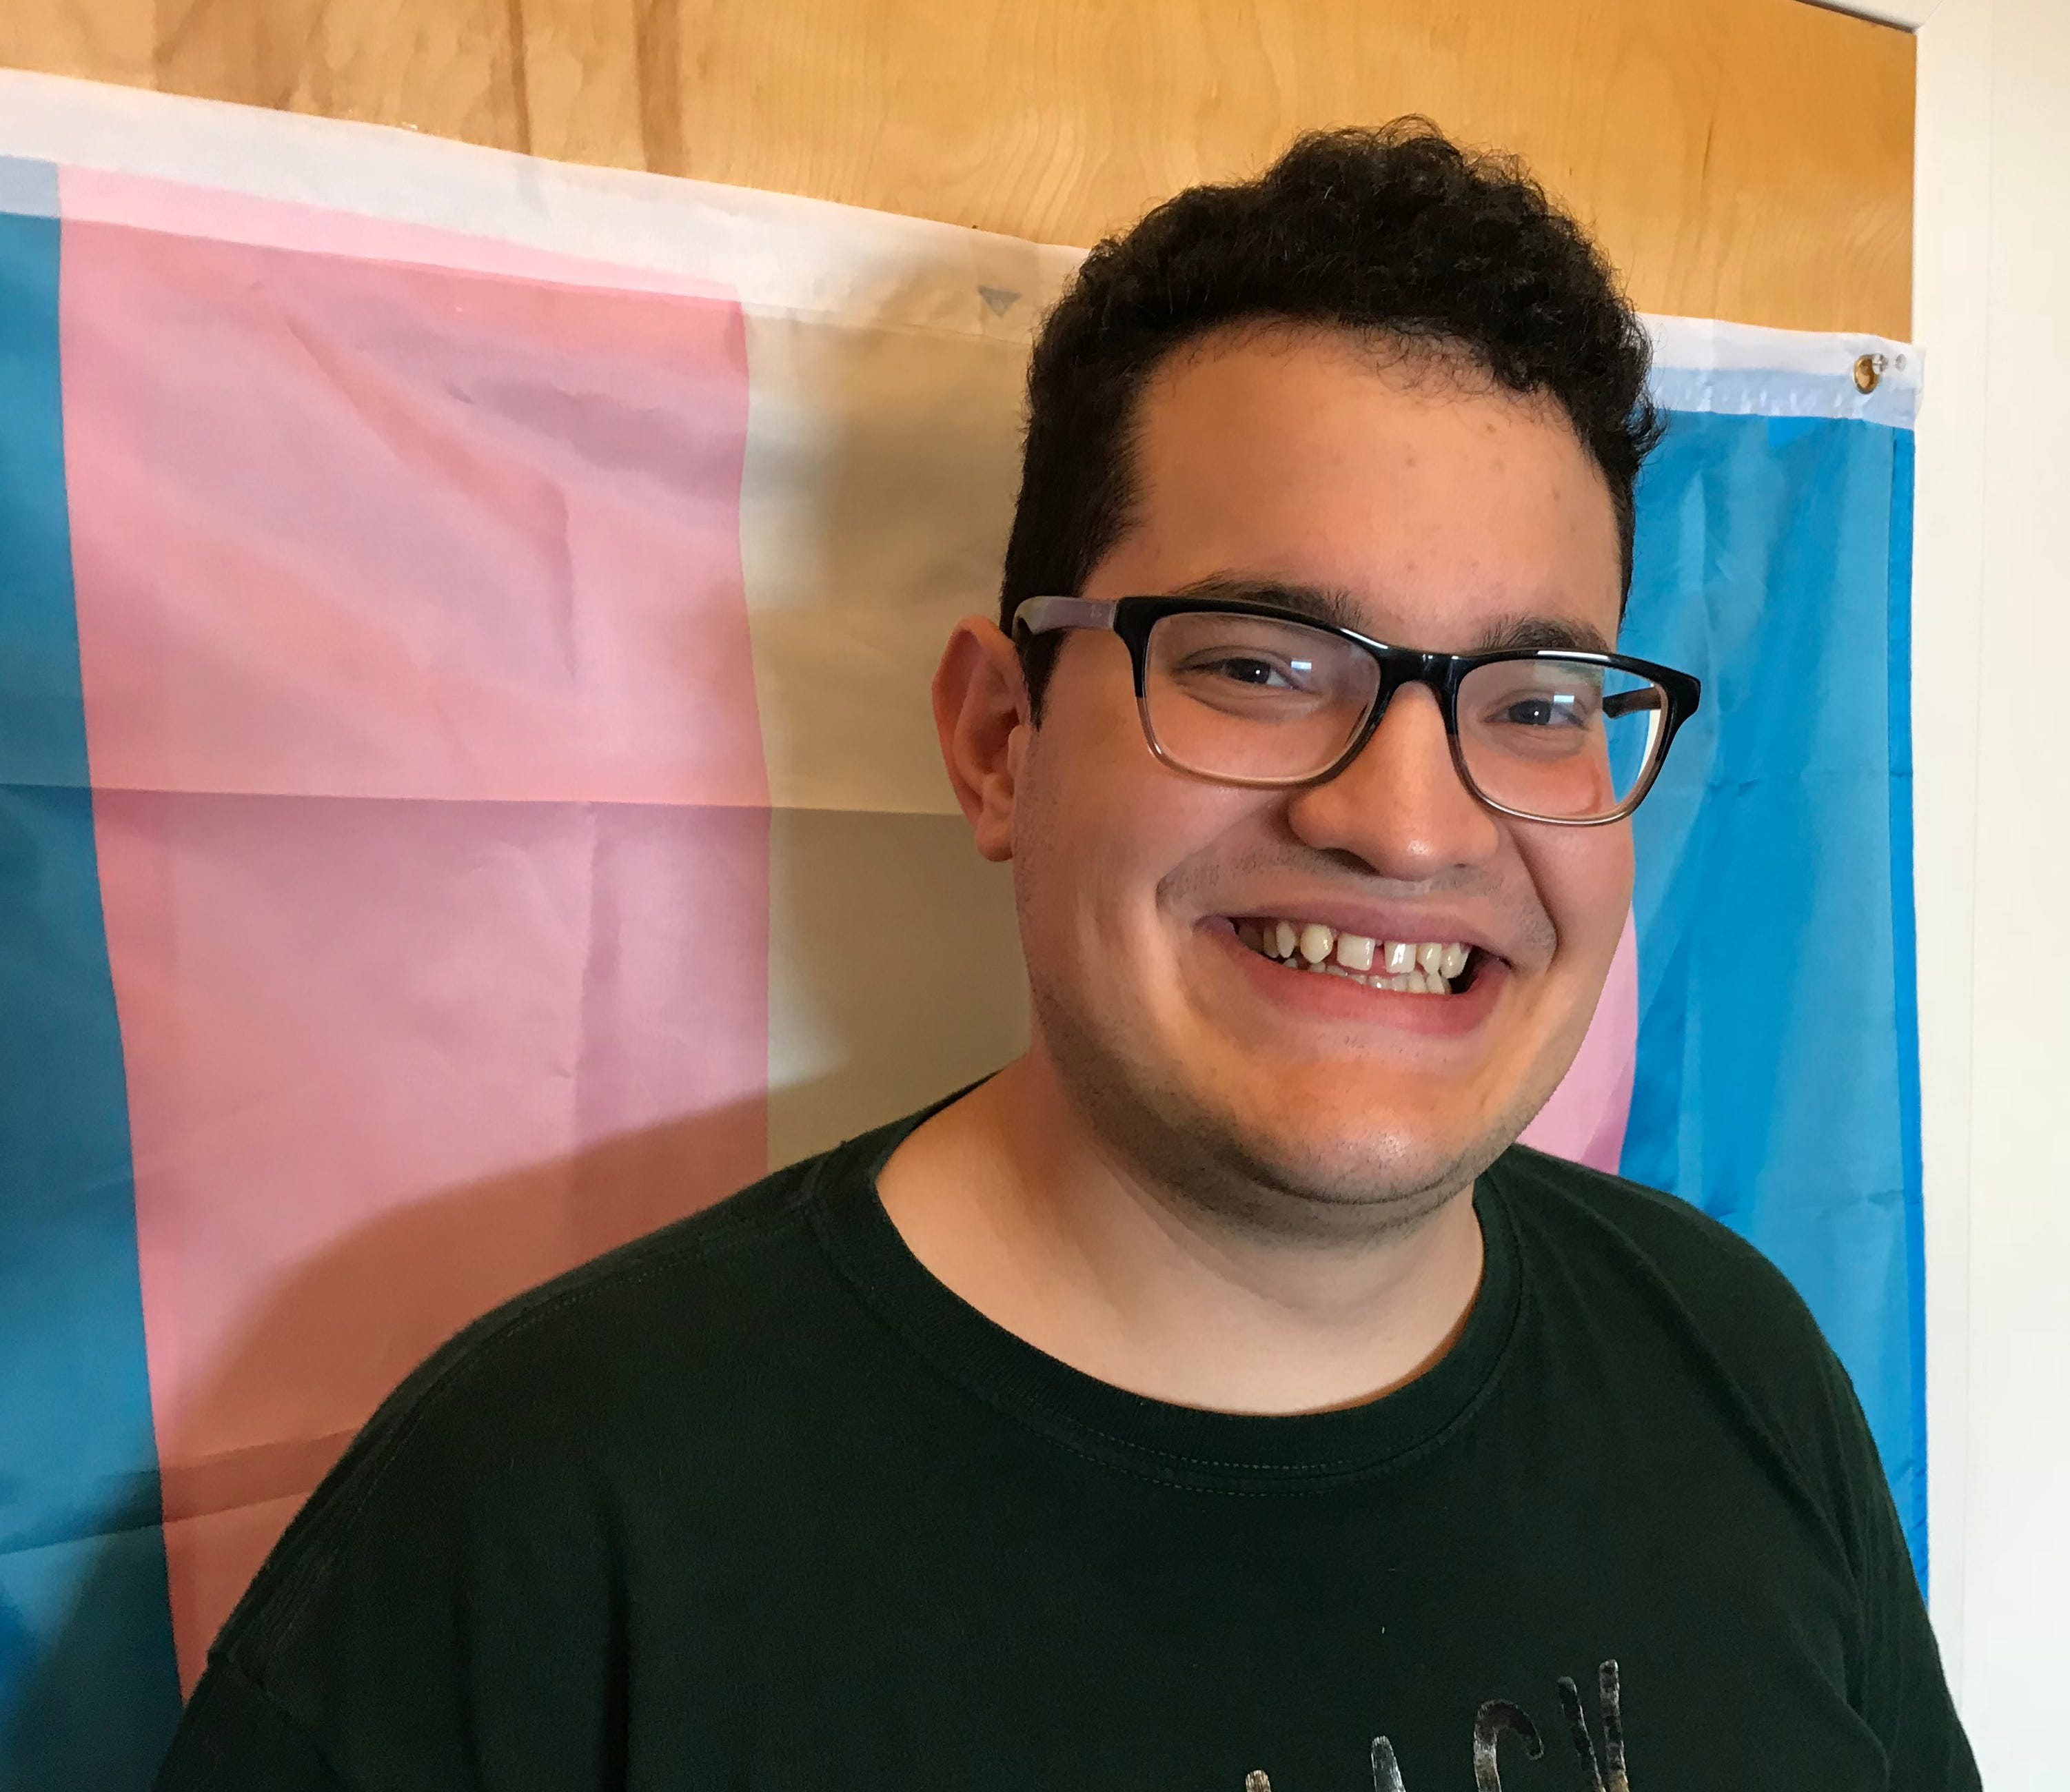 Pride Center Vermont's Transgender Program Coordinator Gustavo Mercado Muñiz spoke about how Christine Hallquist's campaign is inspiring to the entire community of transgender identities on Oct. 10, 2018.